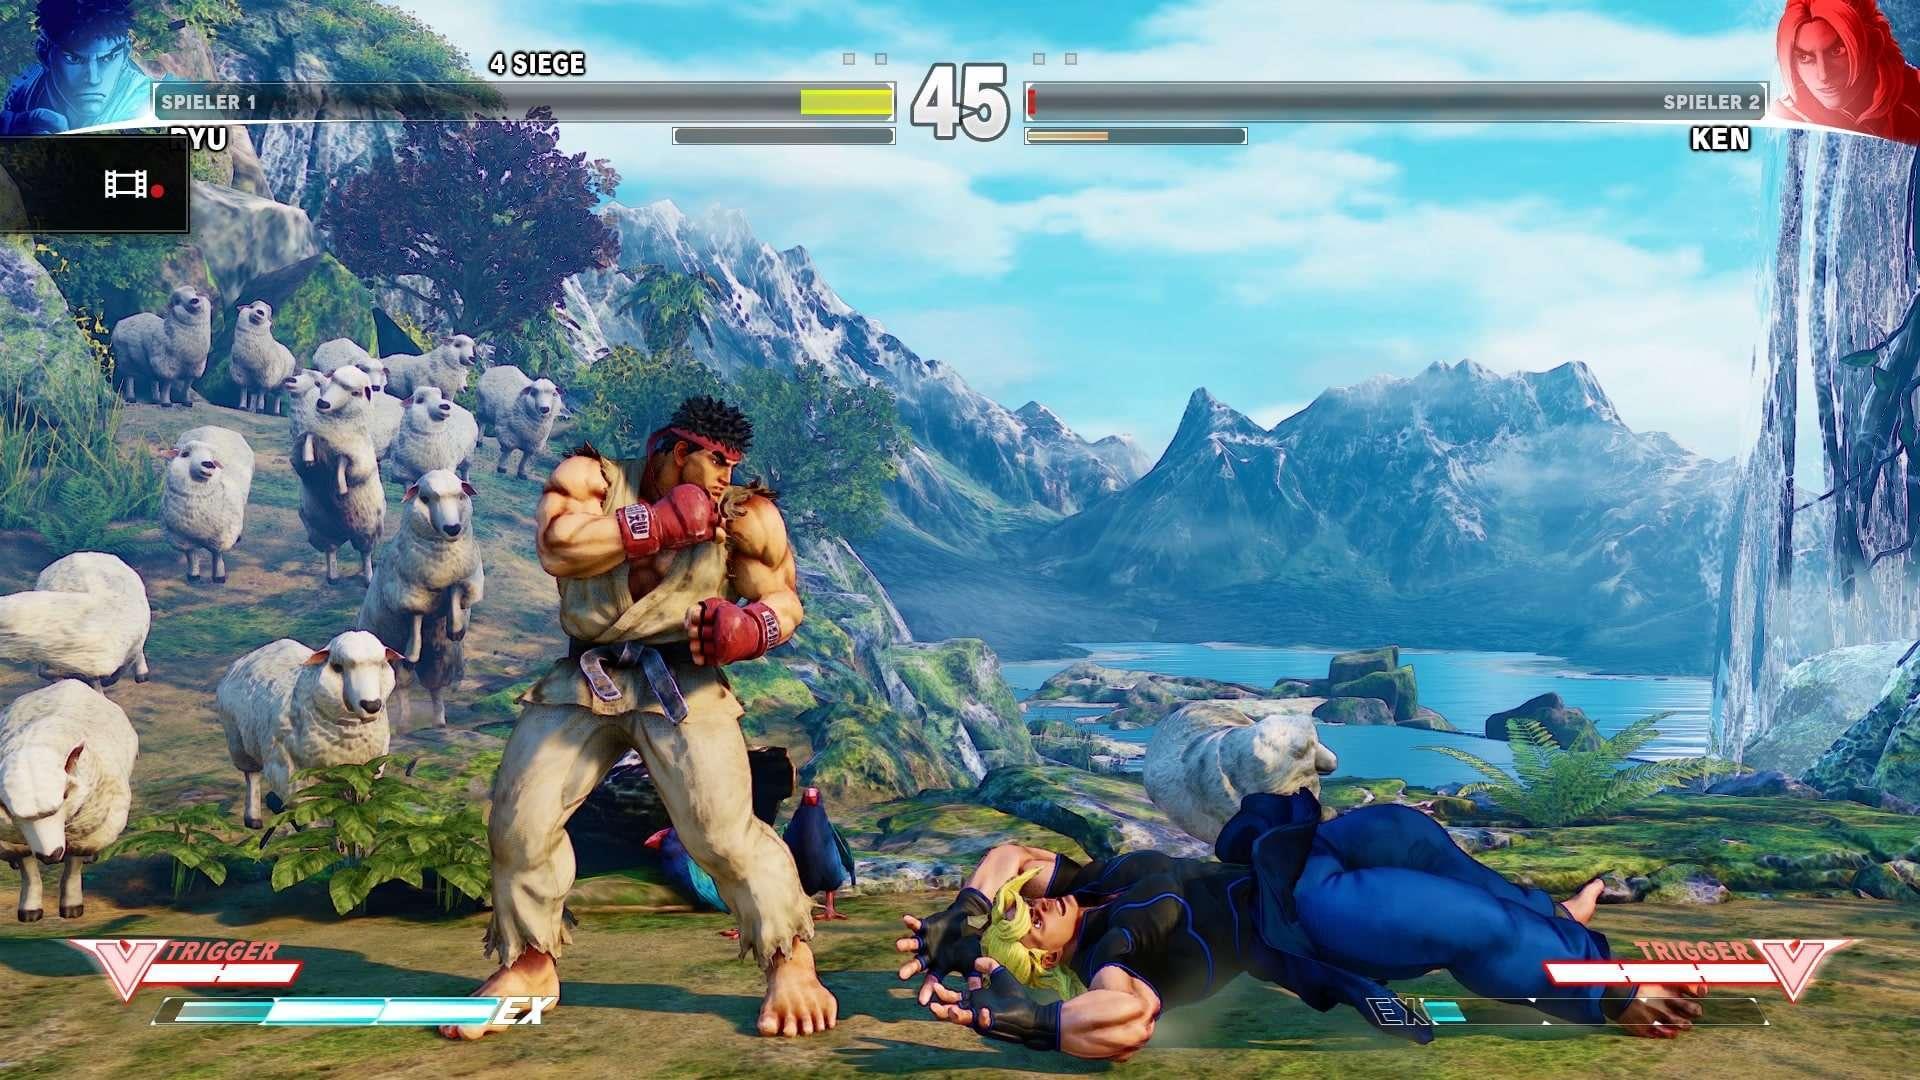 Hadoken strikes again – Street Fighter V (PS4) kurz angespielt techboys.de • smarte News, auf den Punkt!